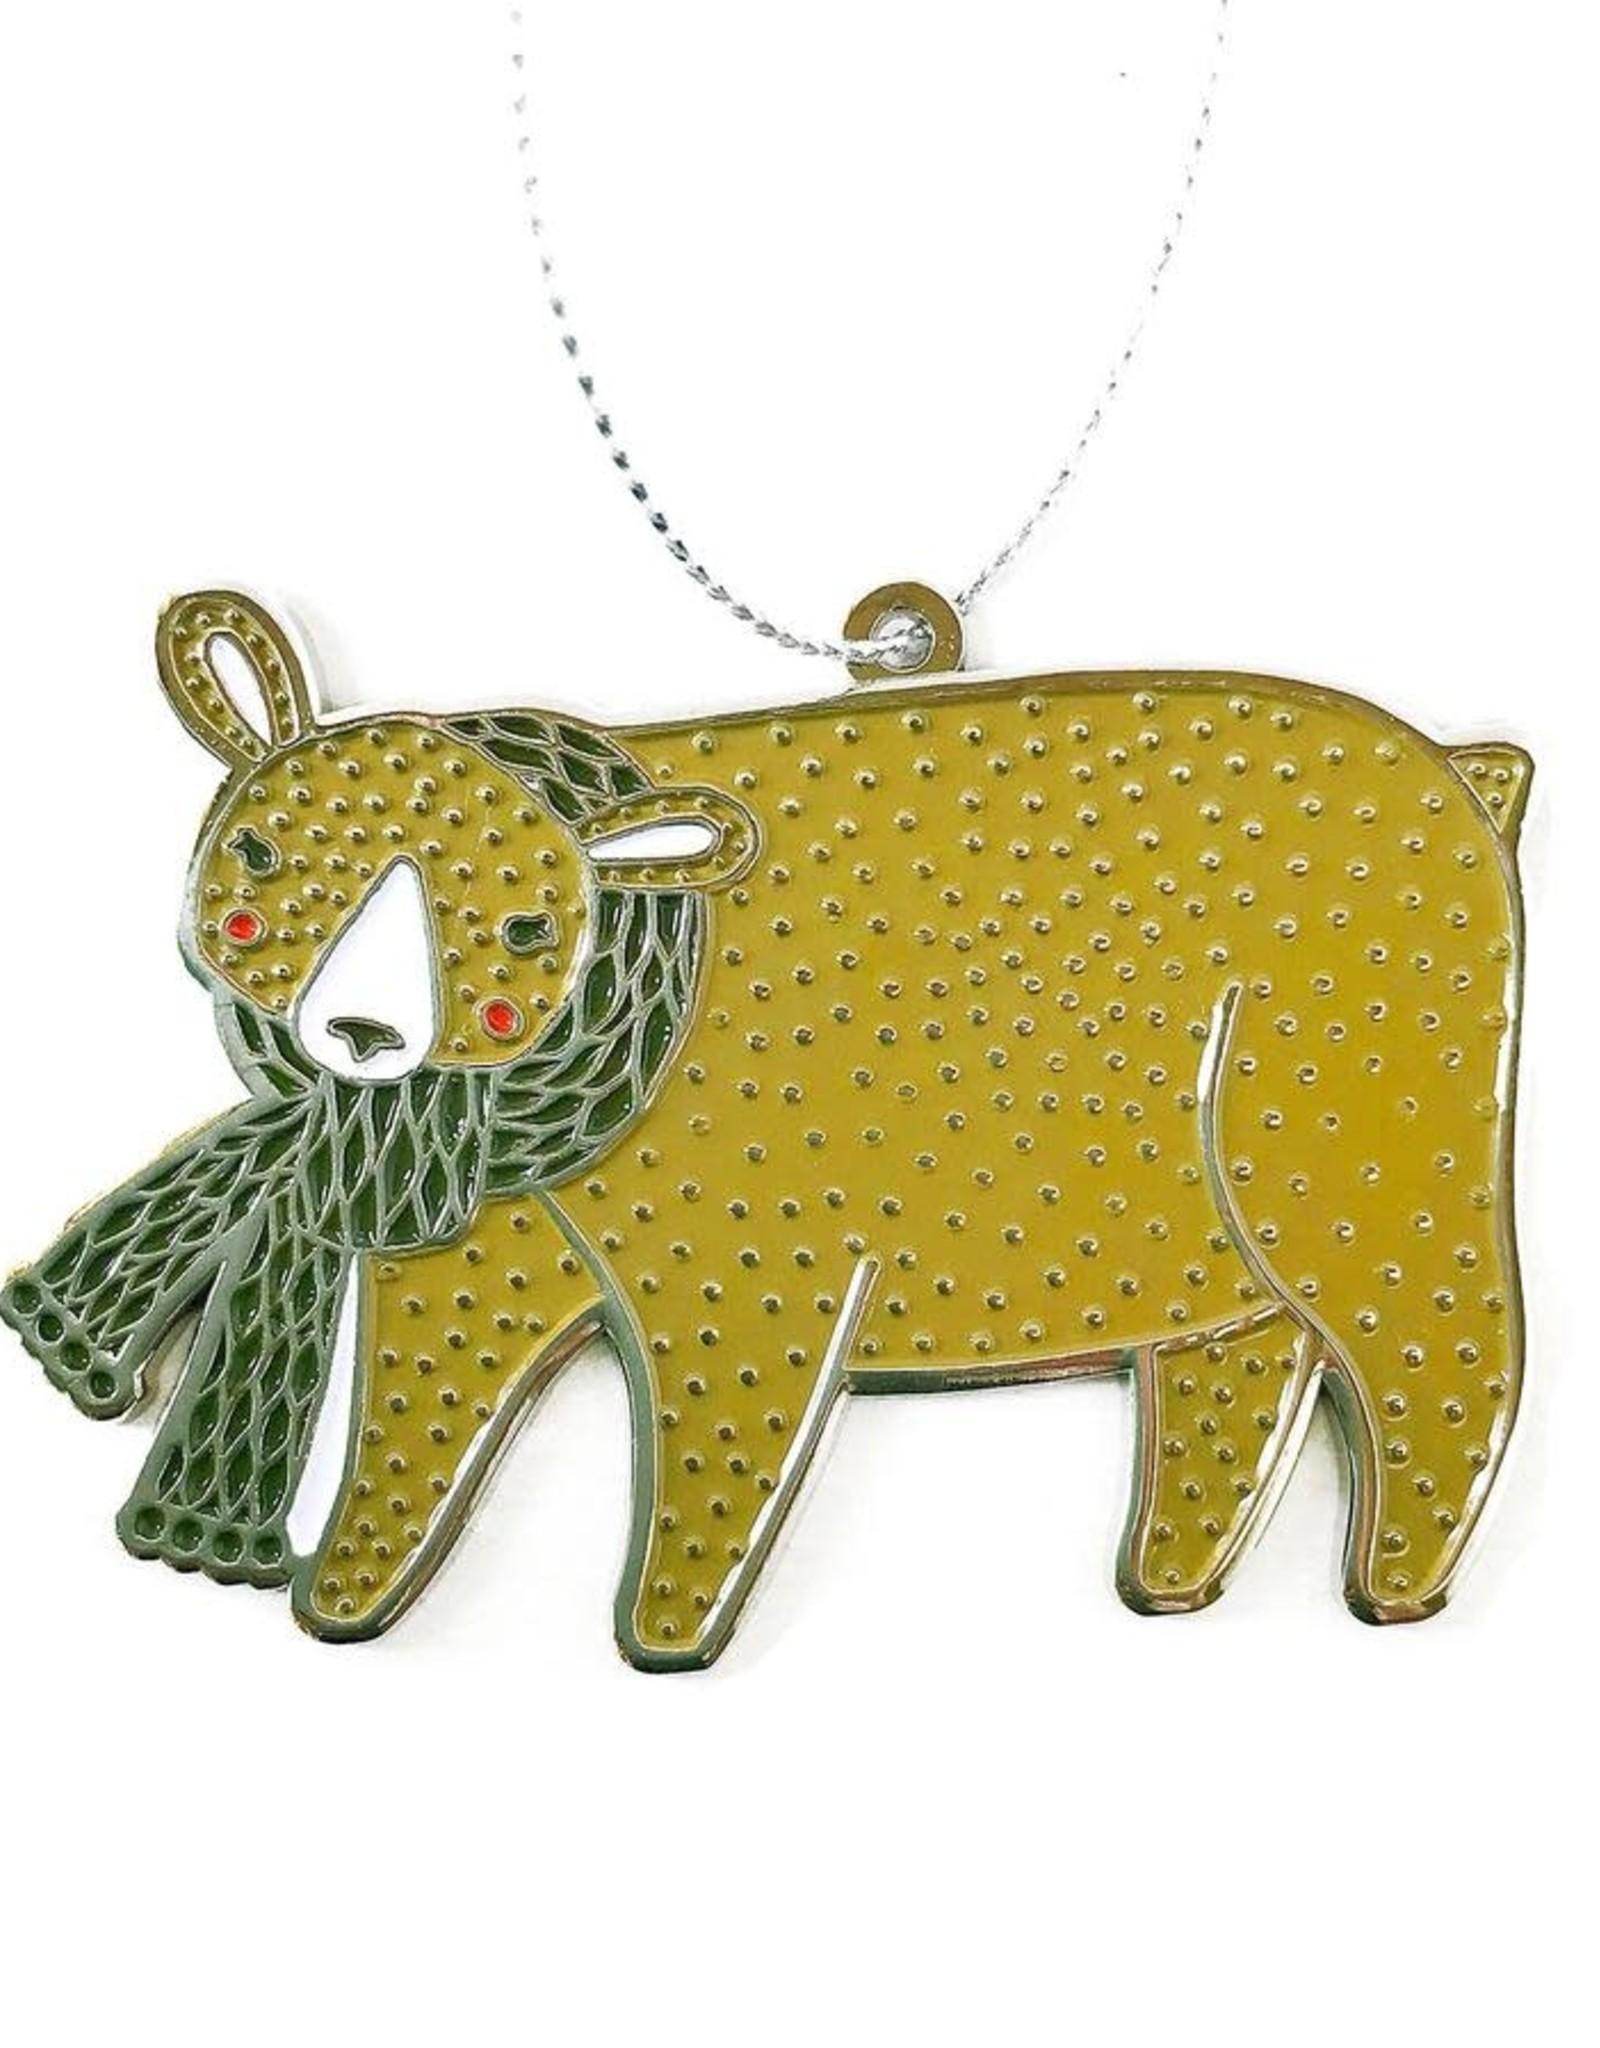 Merriment Bear Enamel Ornament